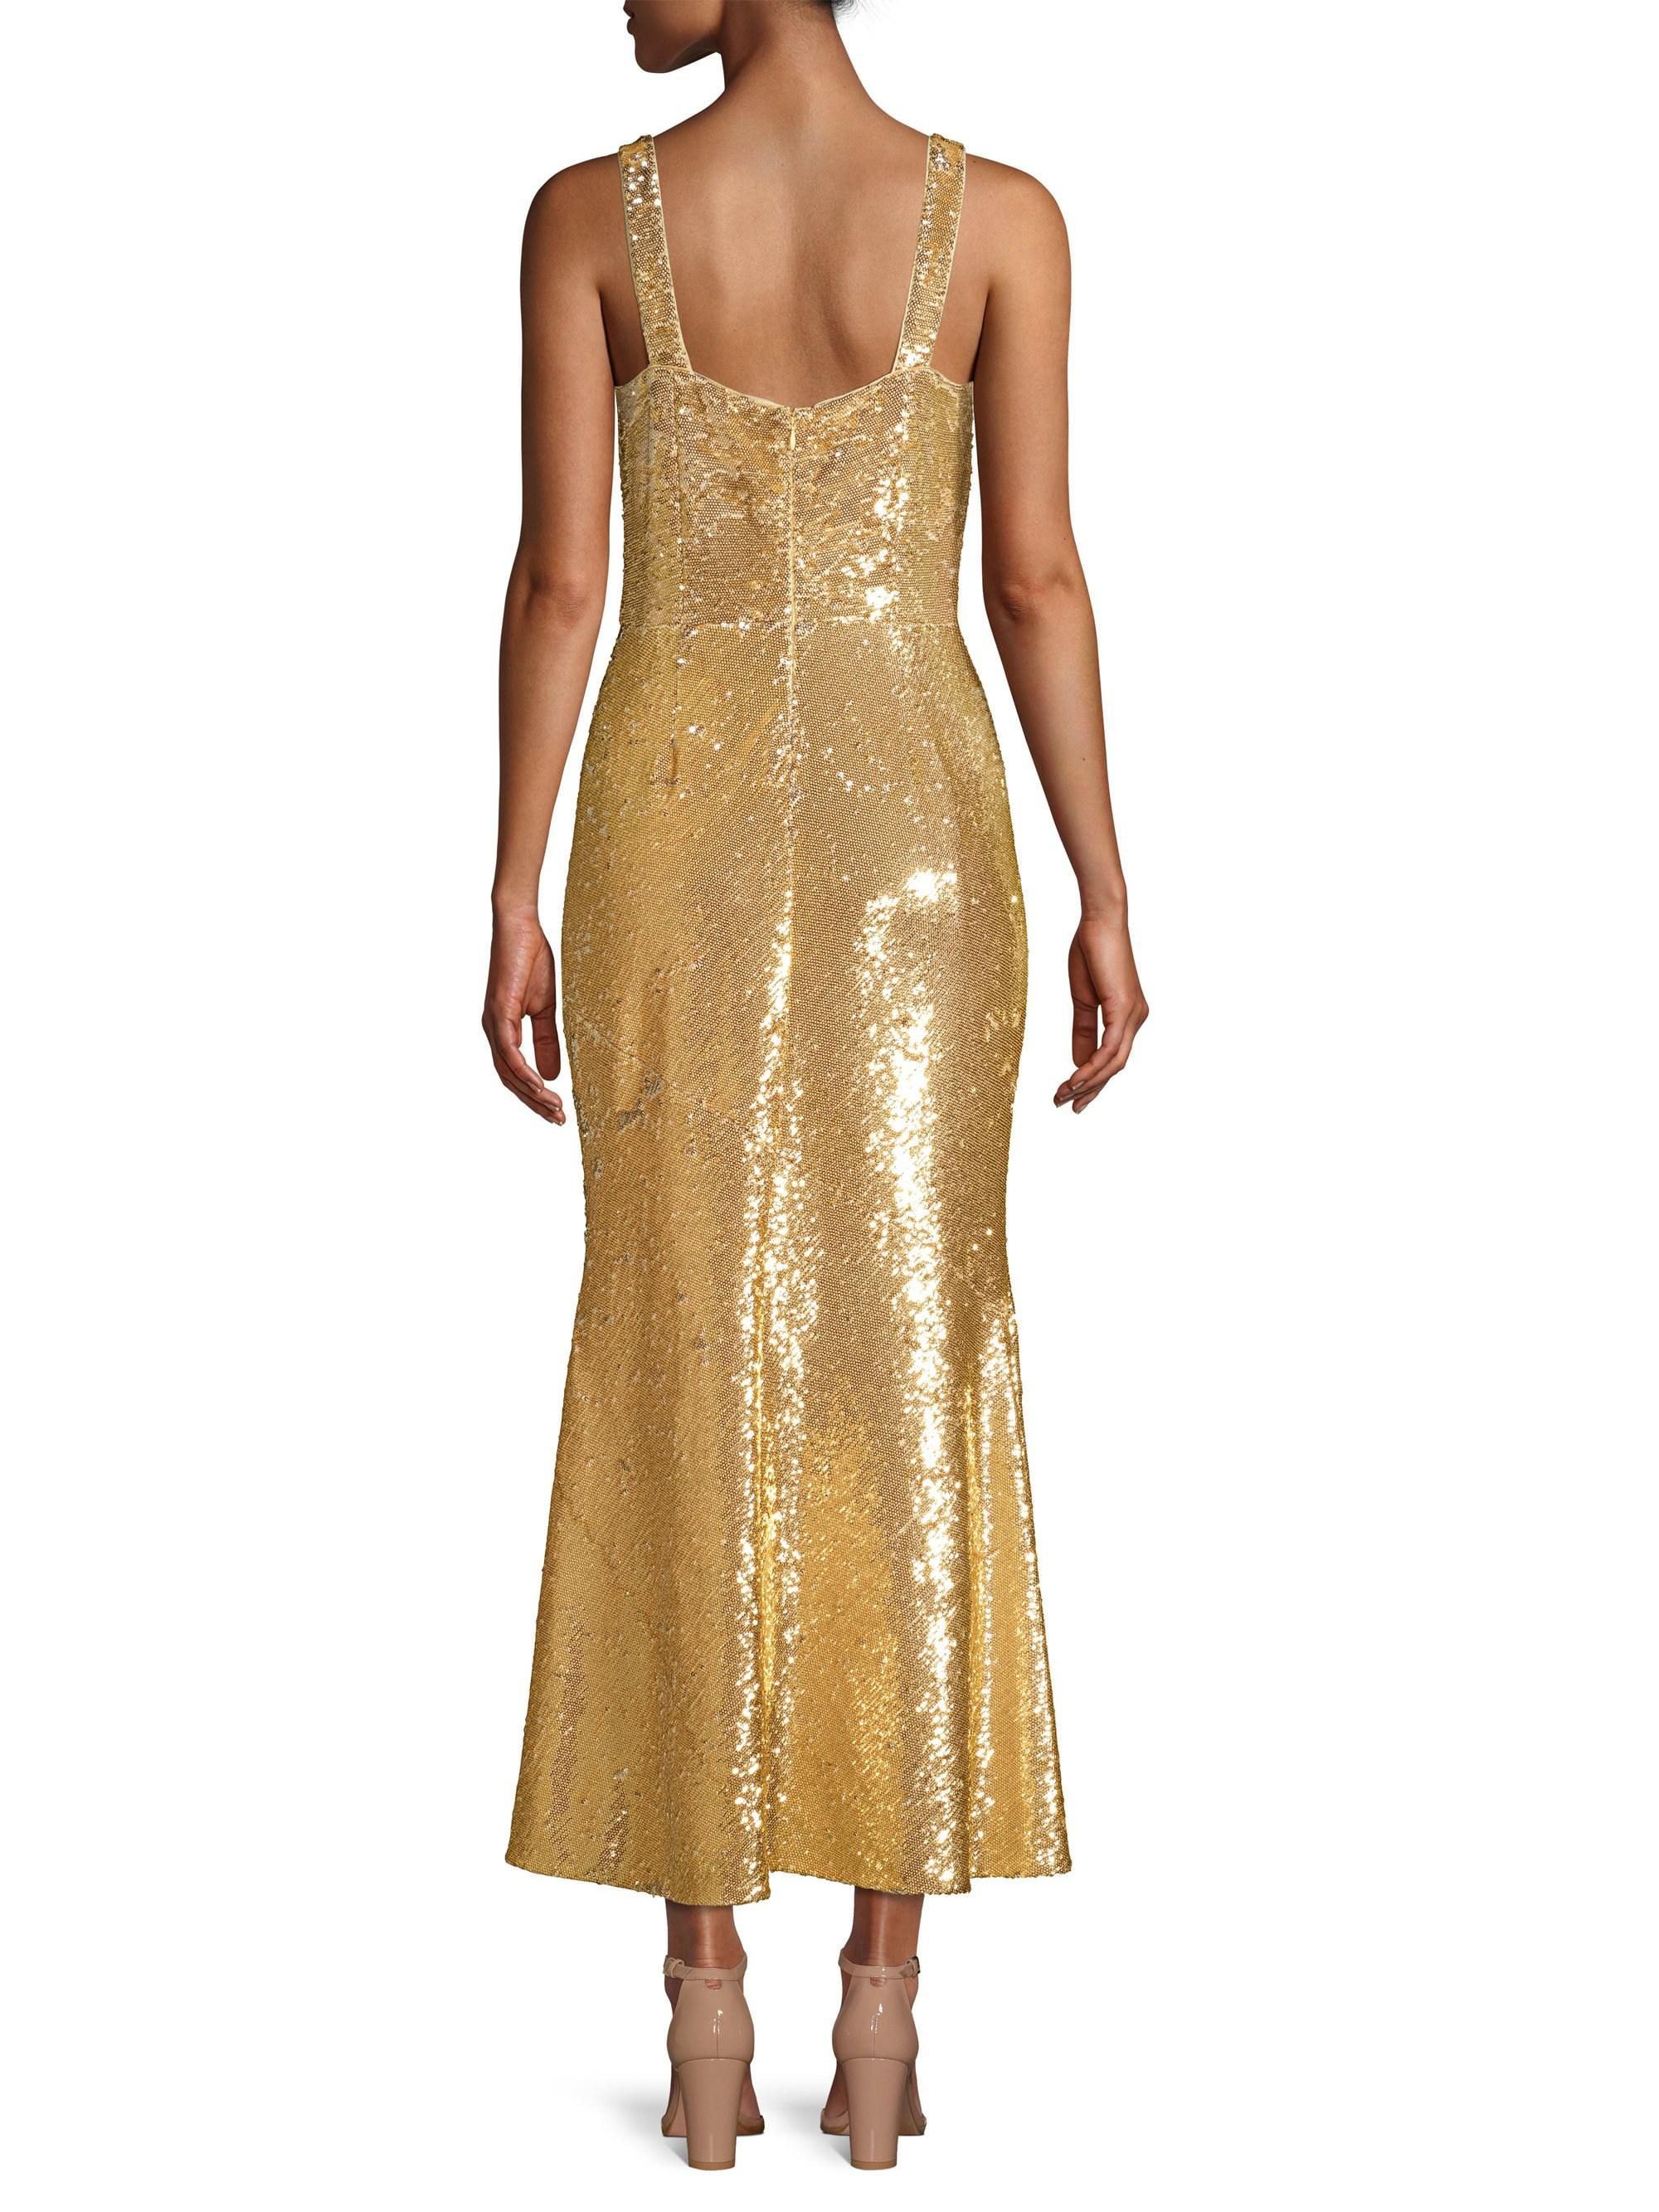 f4b17caf8d55 Rachel Zoe Lola Sequin Flounce Midi Dress in Metallic - Lyst